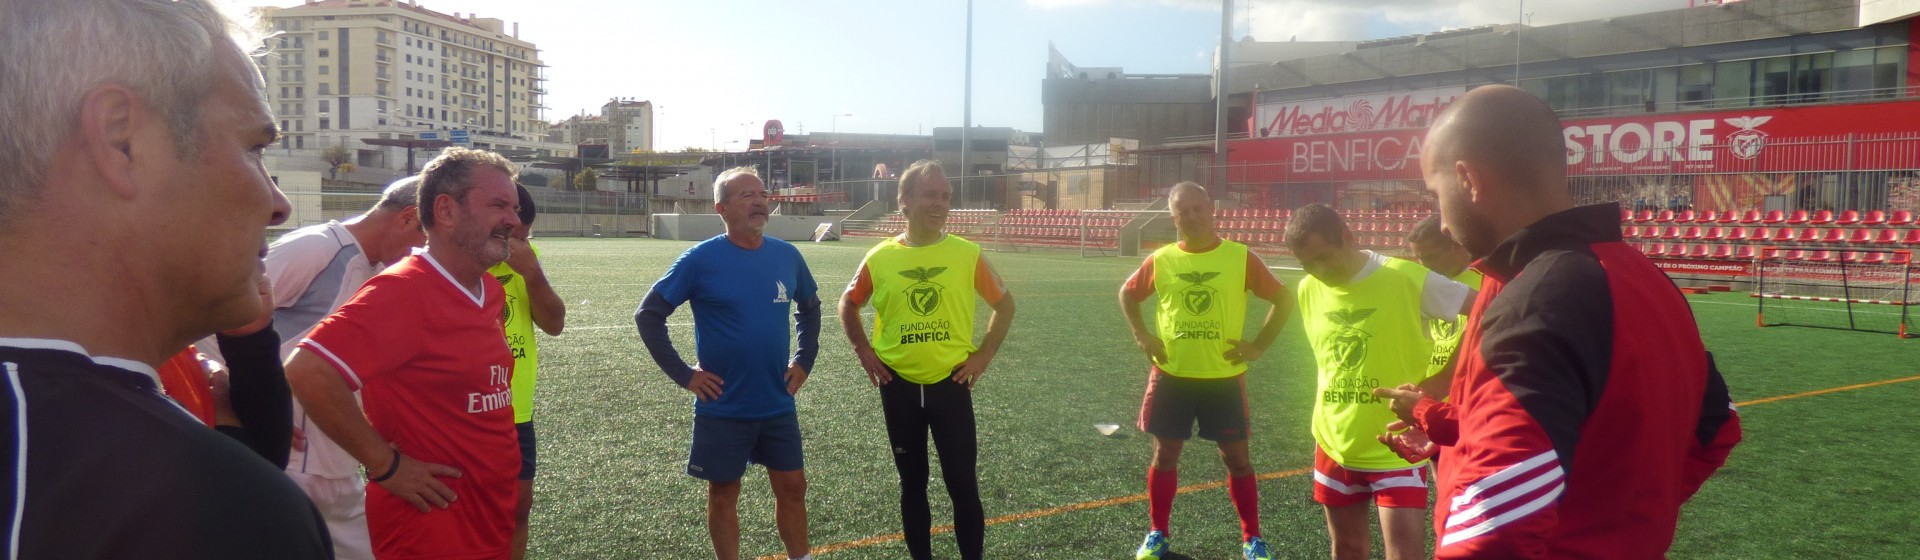 S.L. Benfica Foundation, Walking Football European Legends